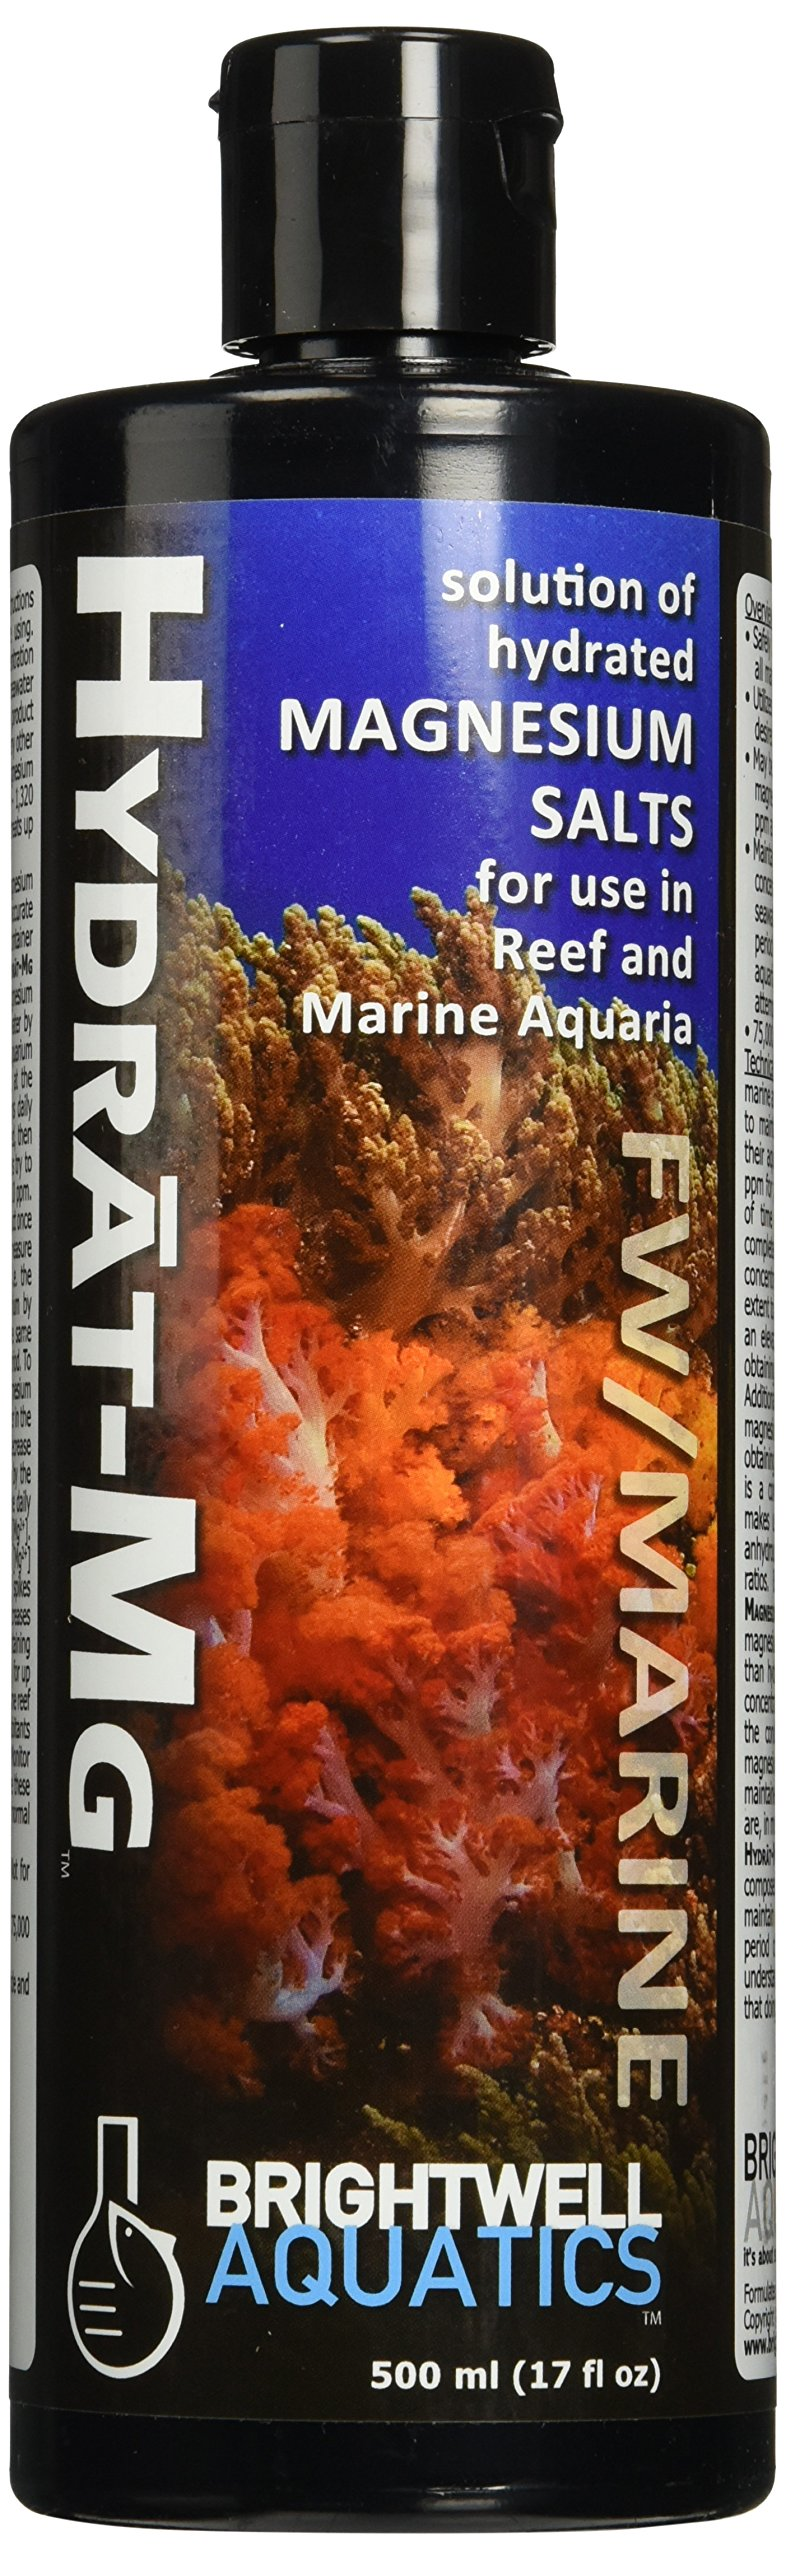 Brightwell Aquatics ABAHMG500 Hydrated Magnesium Salt Solution Water Conditioners for Aquarium, 17-Ounce